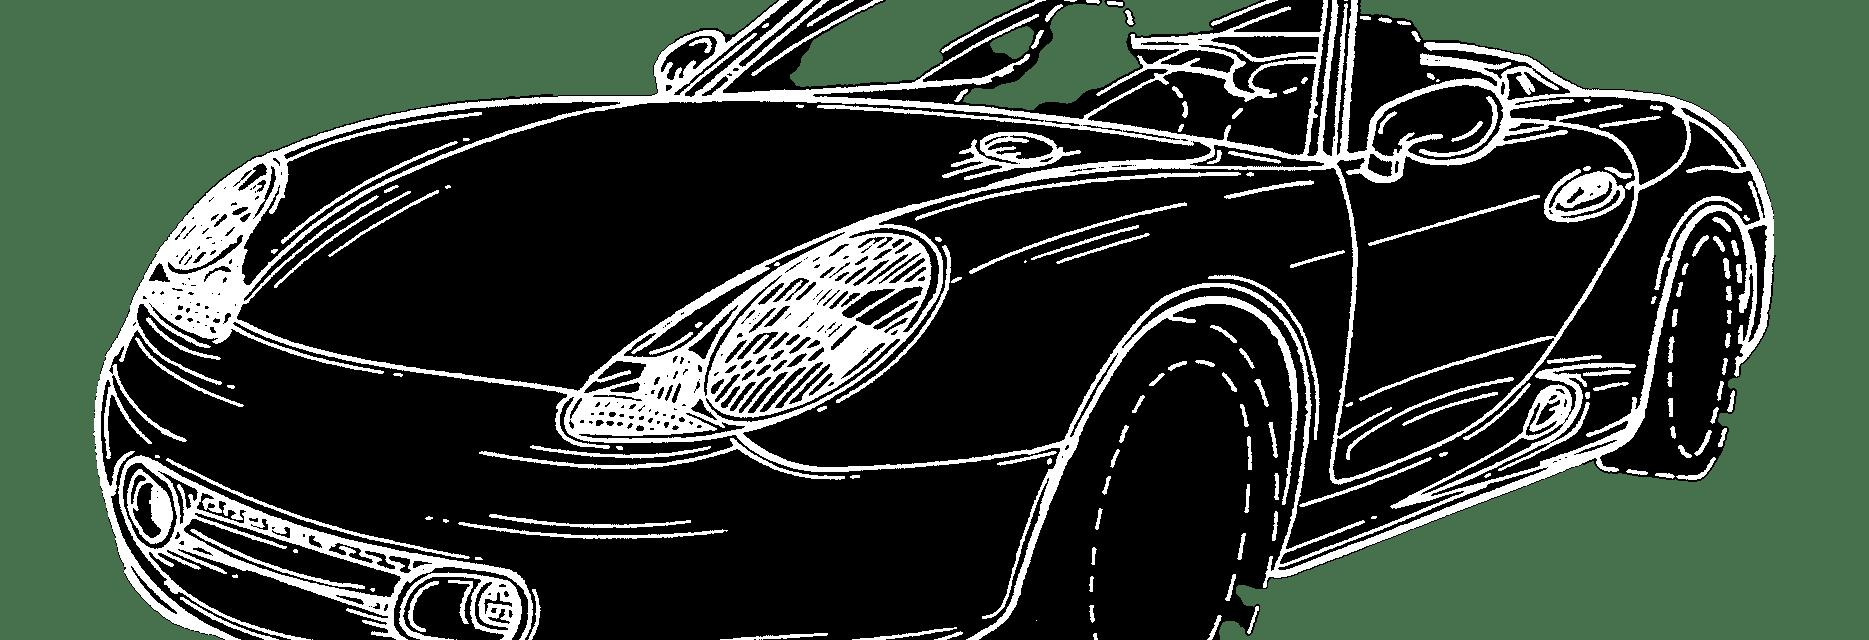 Design Patent of Vehicle